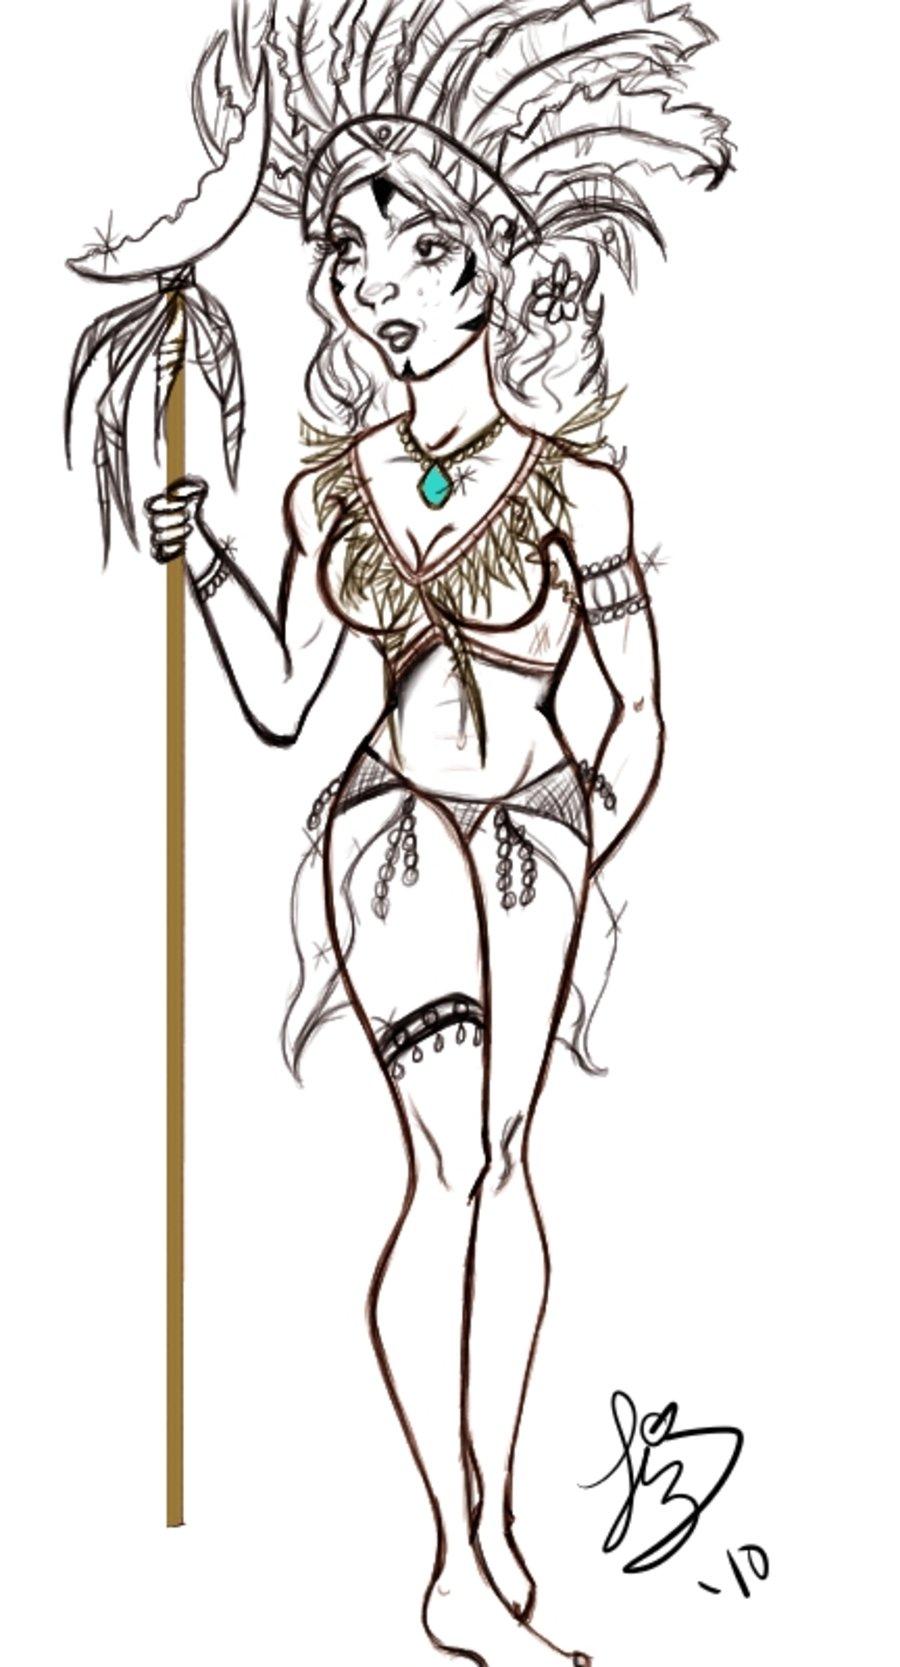 Aztec Warrior clipart princess Tattoos Their and princess drawings